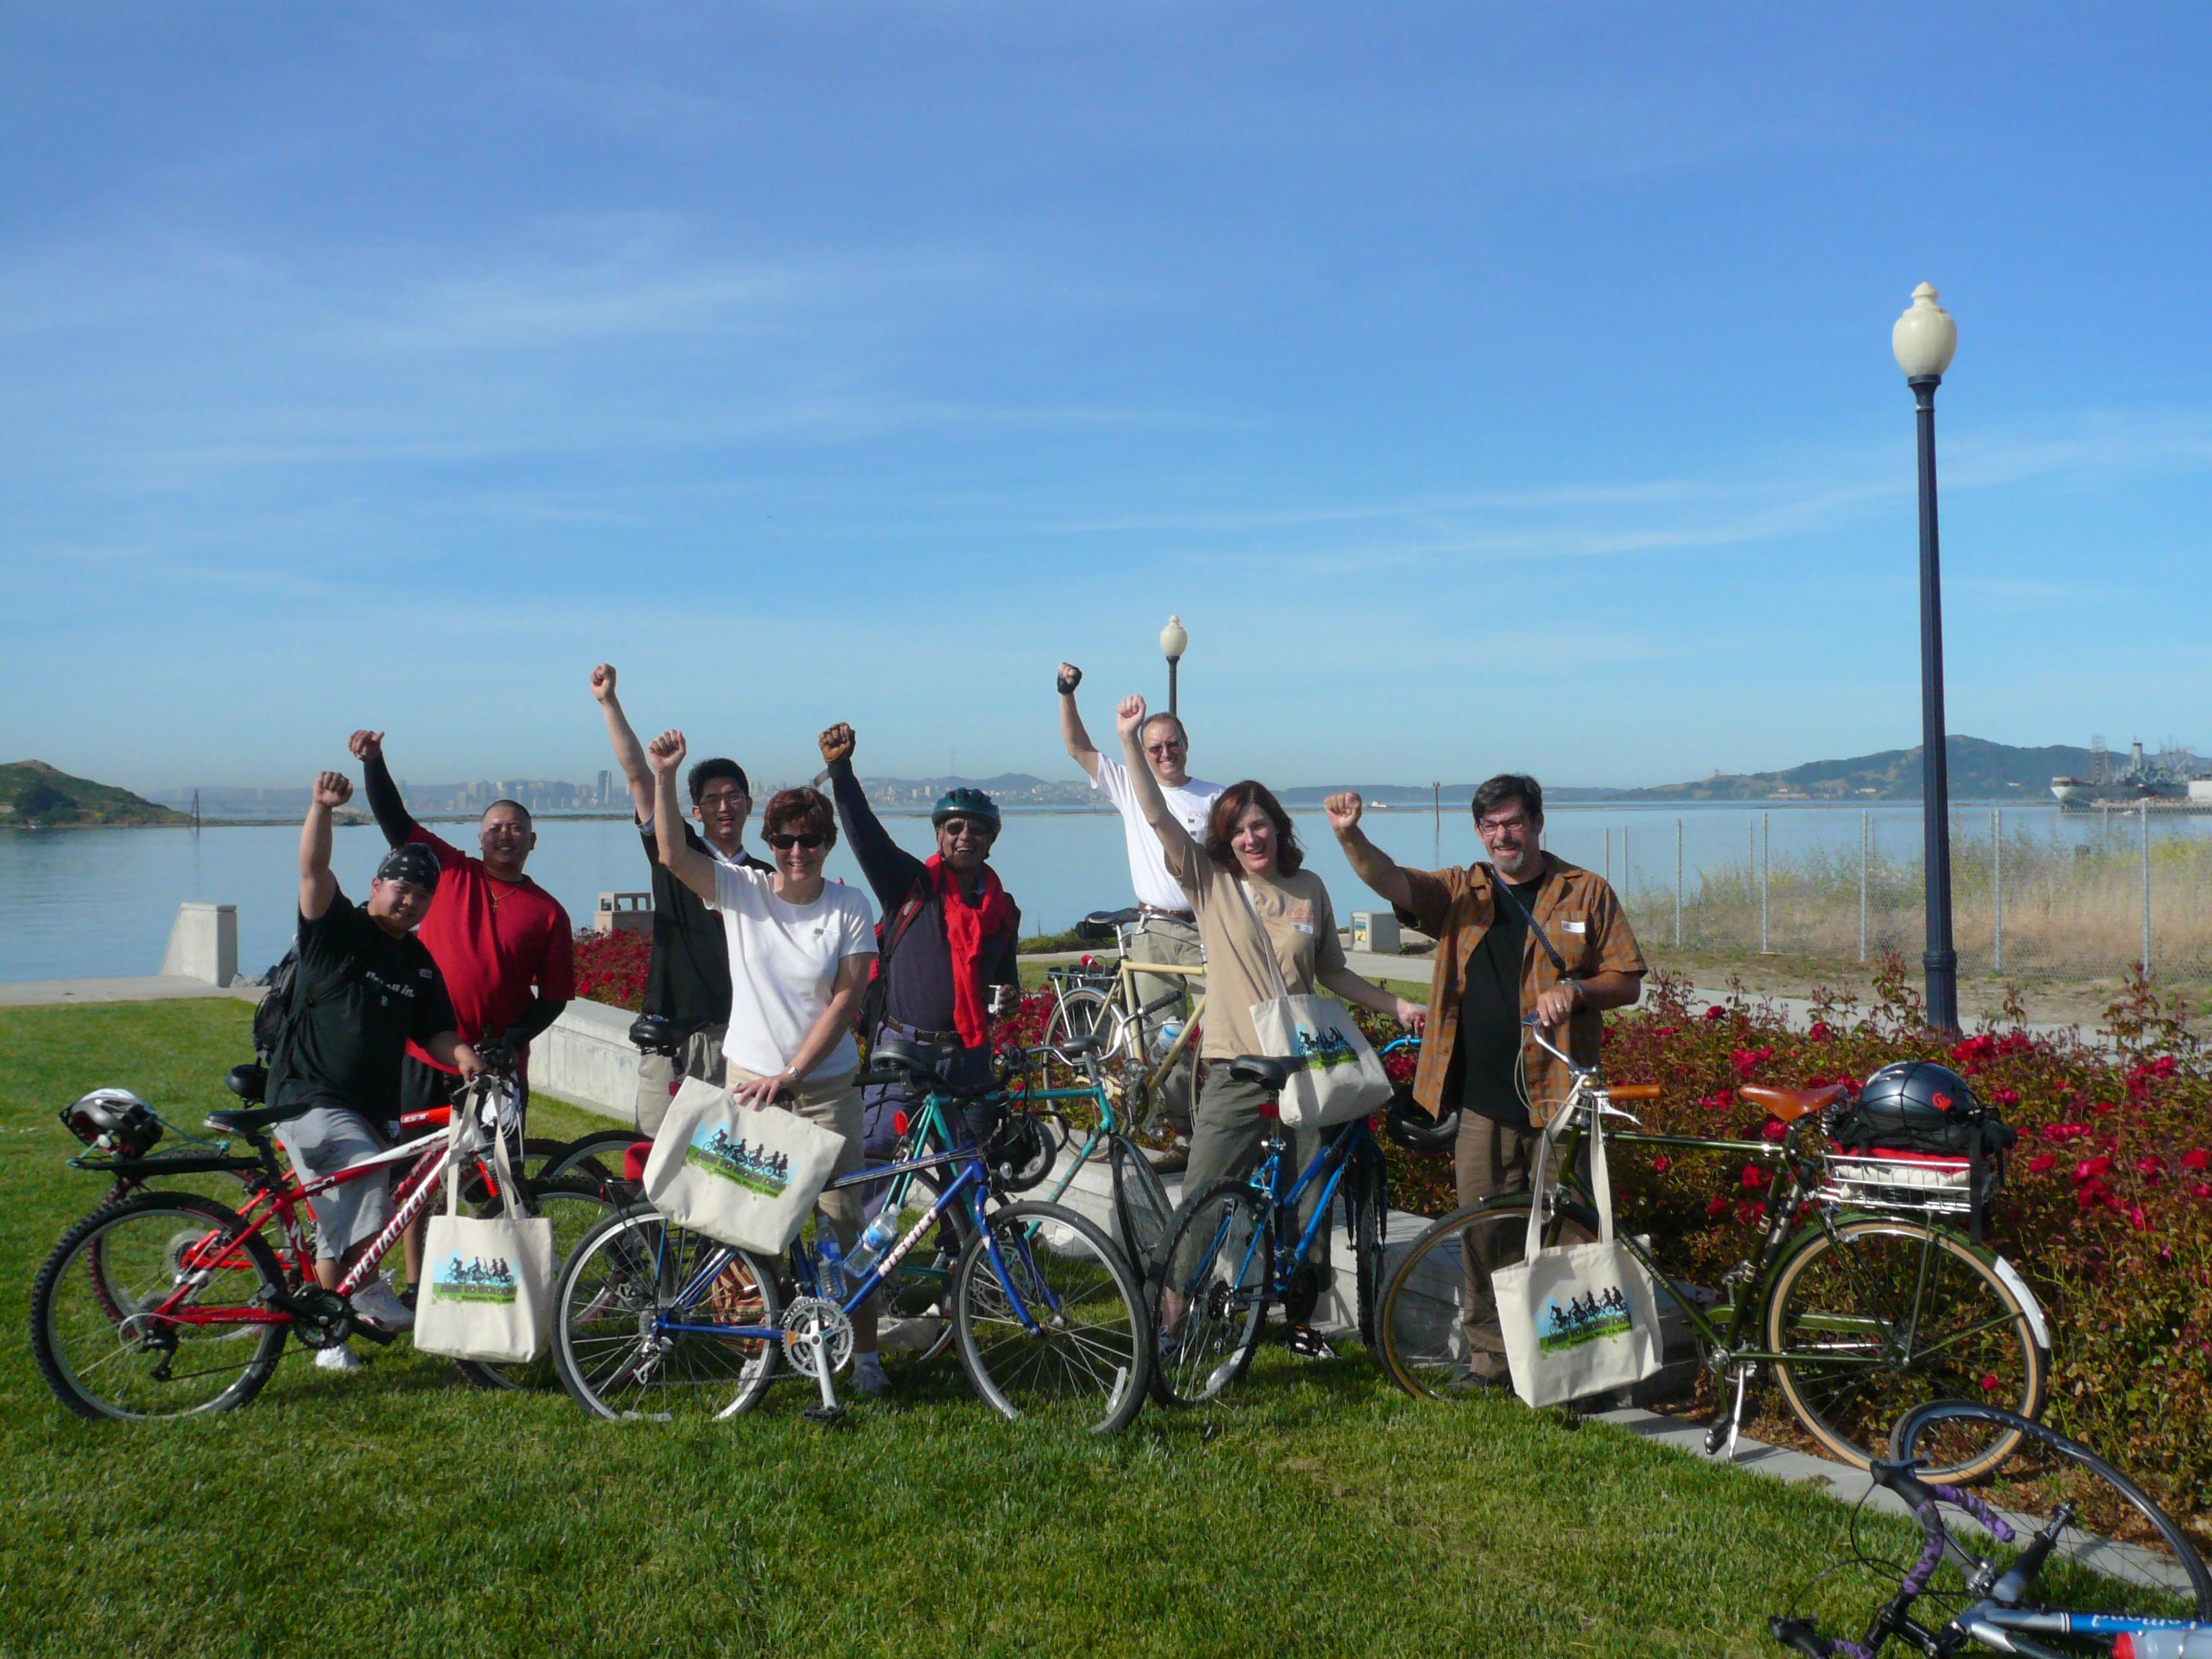 Bike Power - Team Inovis arrives at the Richmond Marina